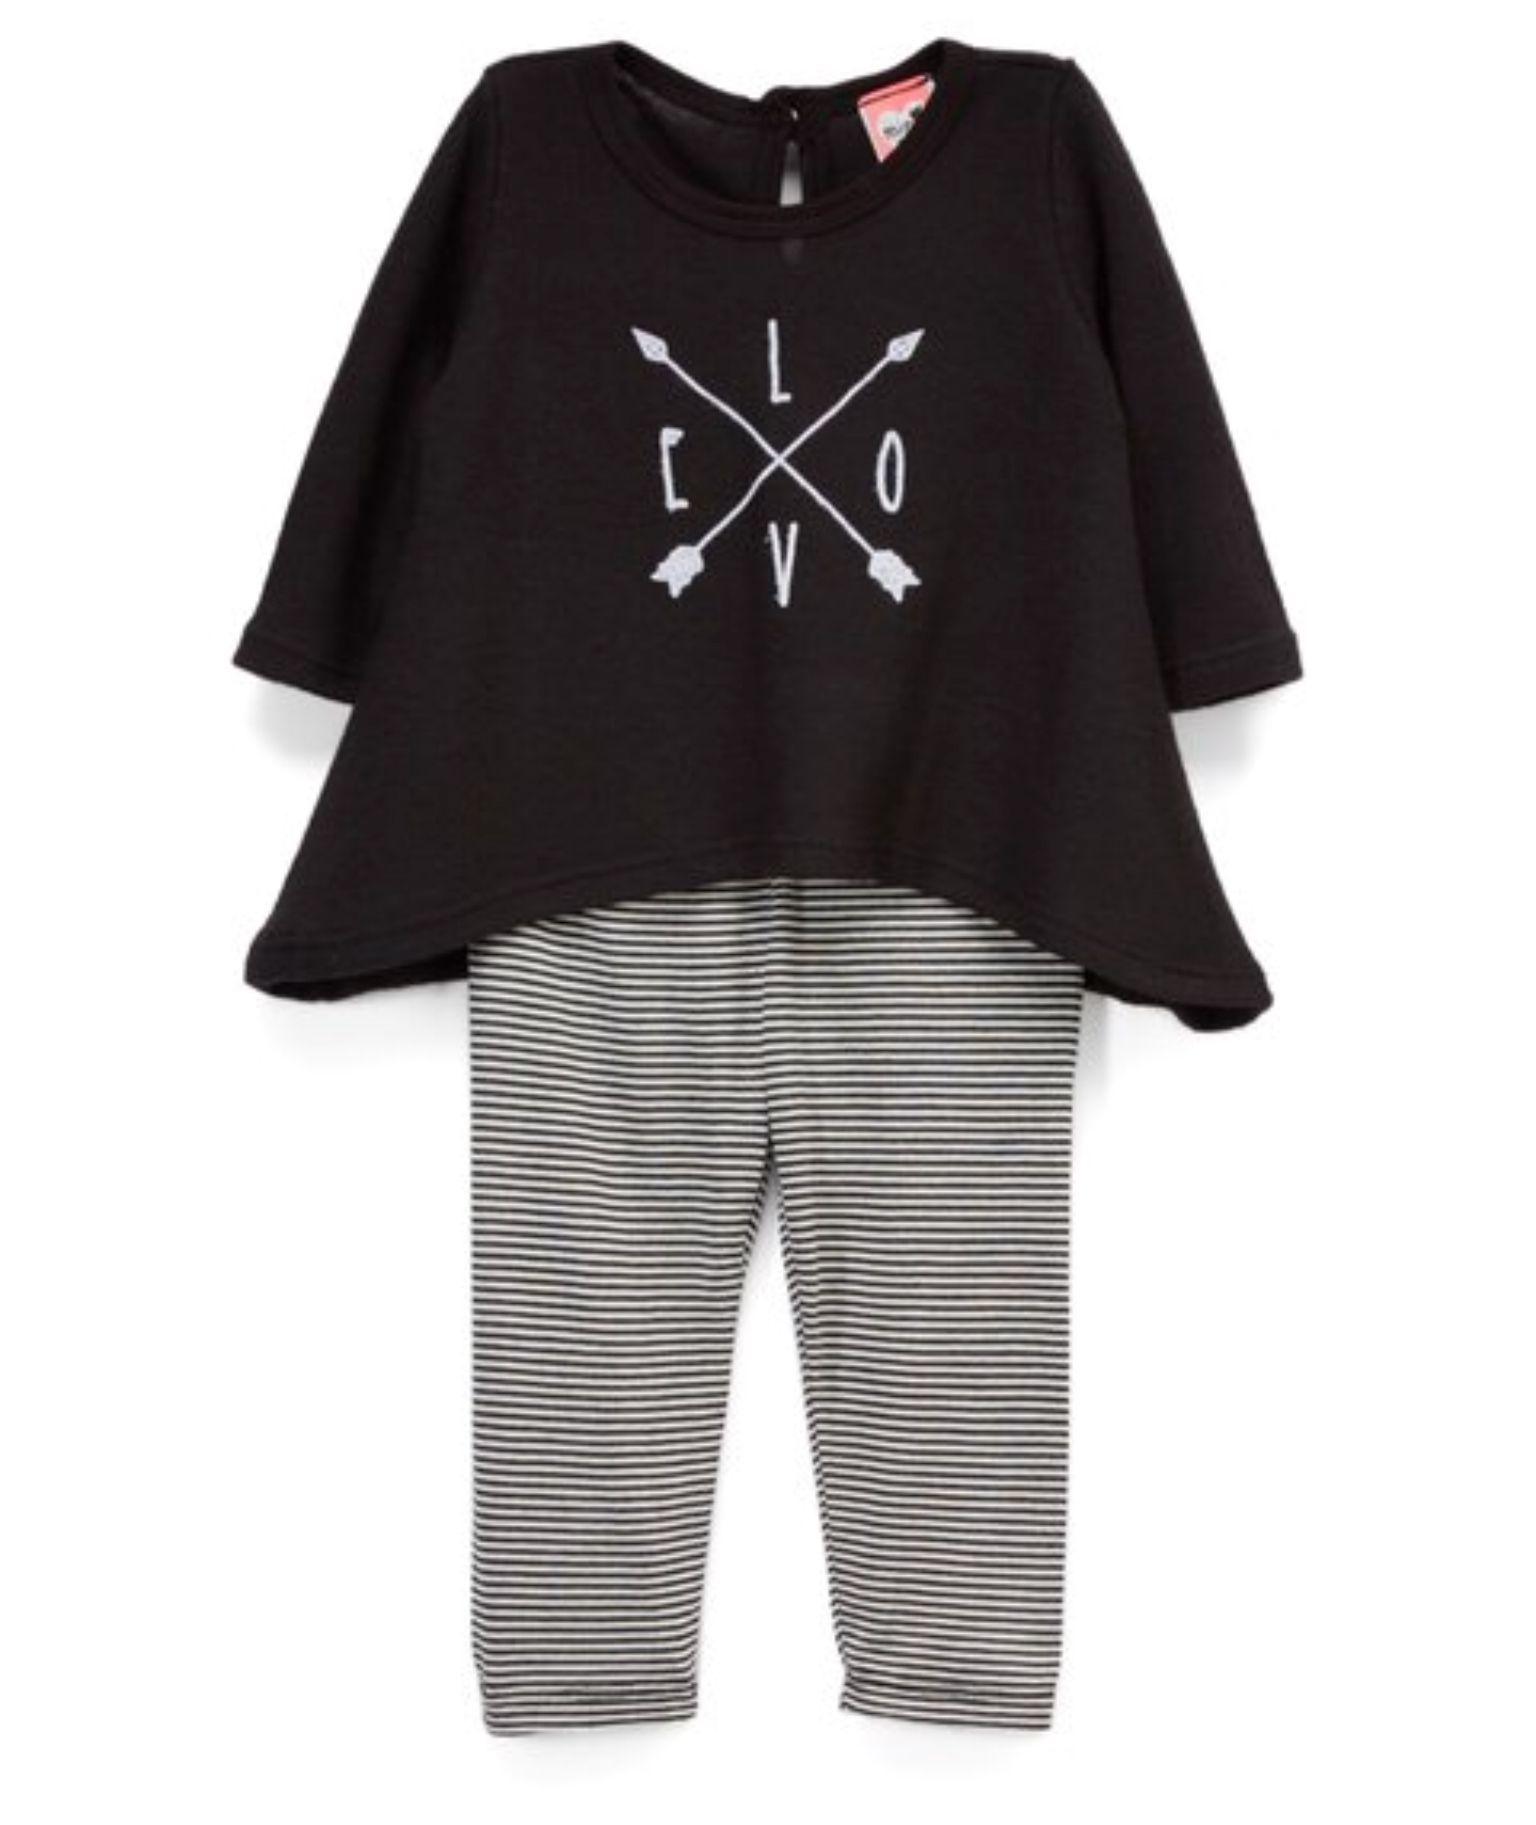 mini mini Black & White Baby Chic Top & Leggings Infant & Toddler